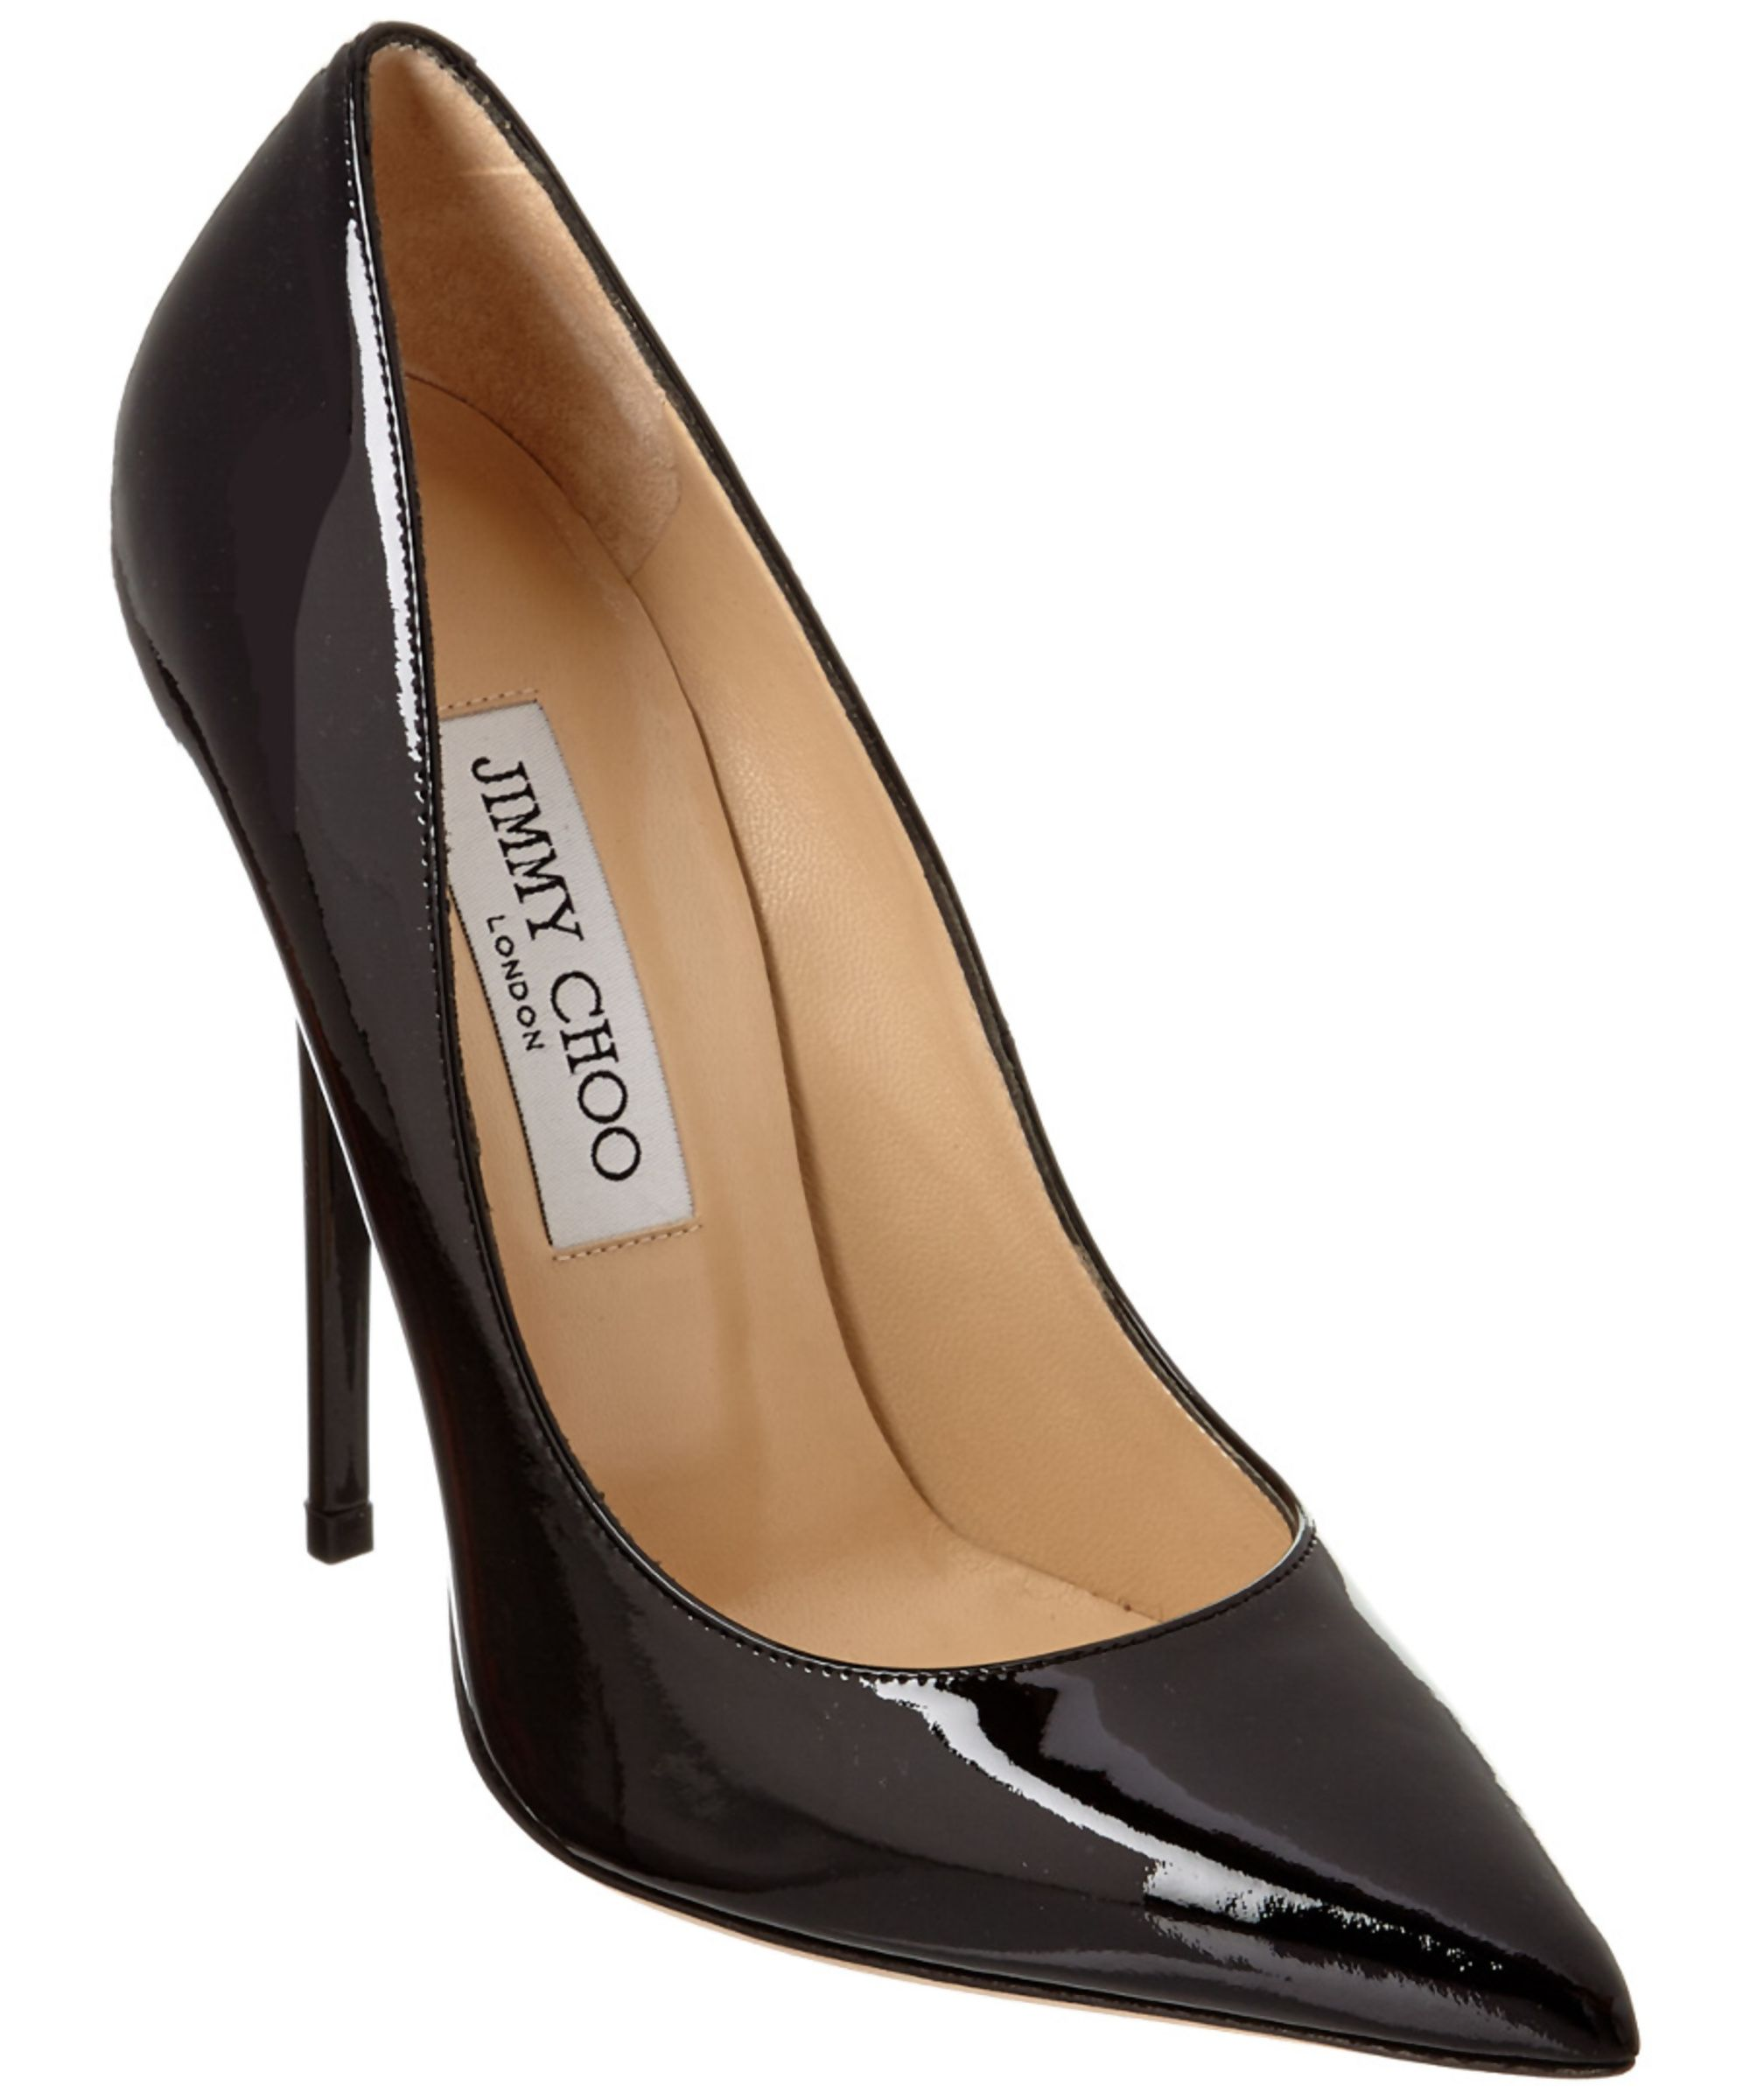 cc4f2c4183 JIMMY CHOO   Jimmy Choo Anouk 120 Patent Pointy-Toe Pump #Shoes #Pumps &  High Heels #JIMMY CHOO